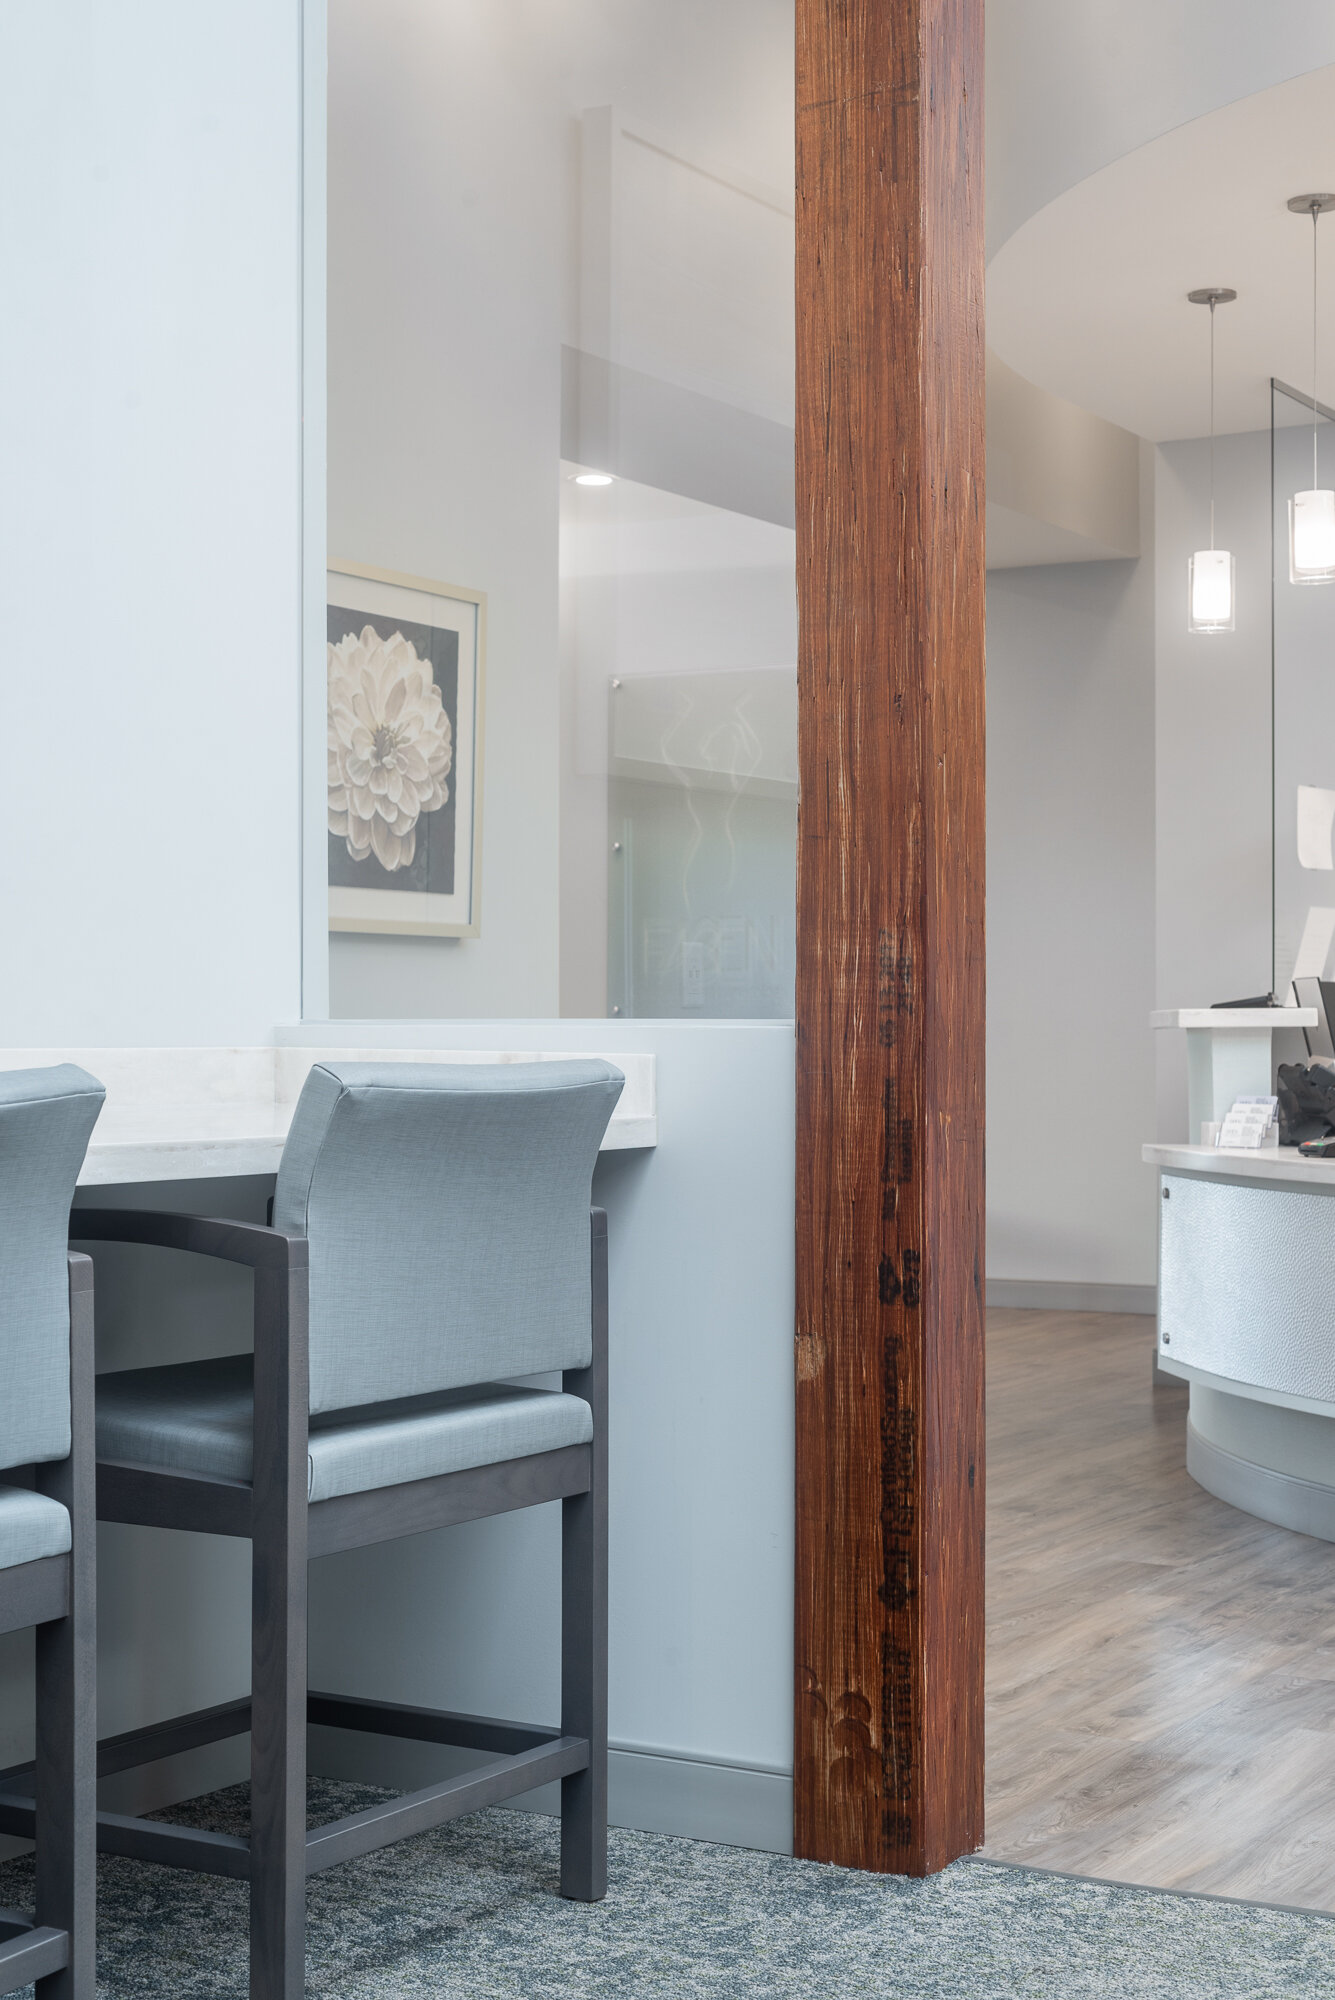 Micamy Design Studio_Interior Design_Faben Obstetrics and Gynelcology_North Florida_Riverplace_San Marco_Healthcare_Office_Medical_Trwobridge_Renovation_Patcraft_Stance_ArcCom (6).jpg